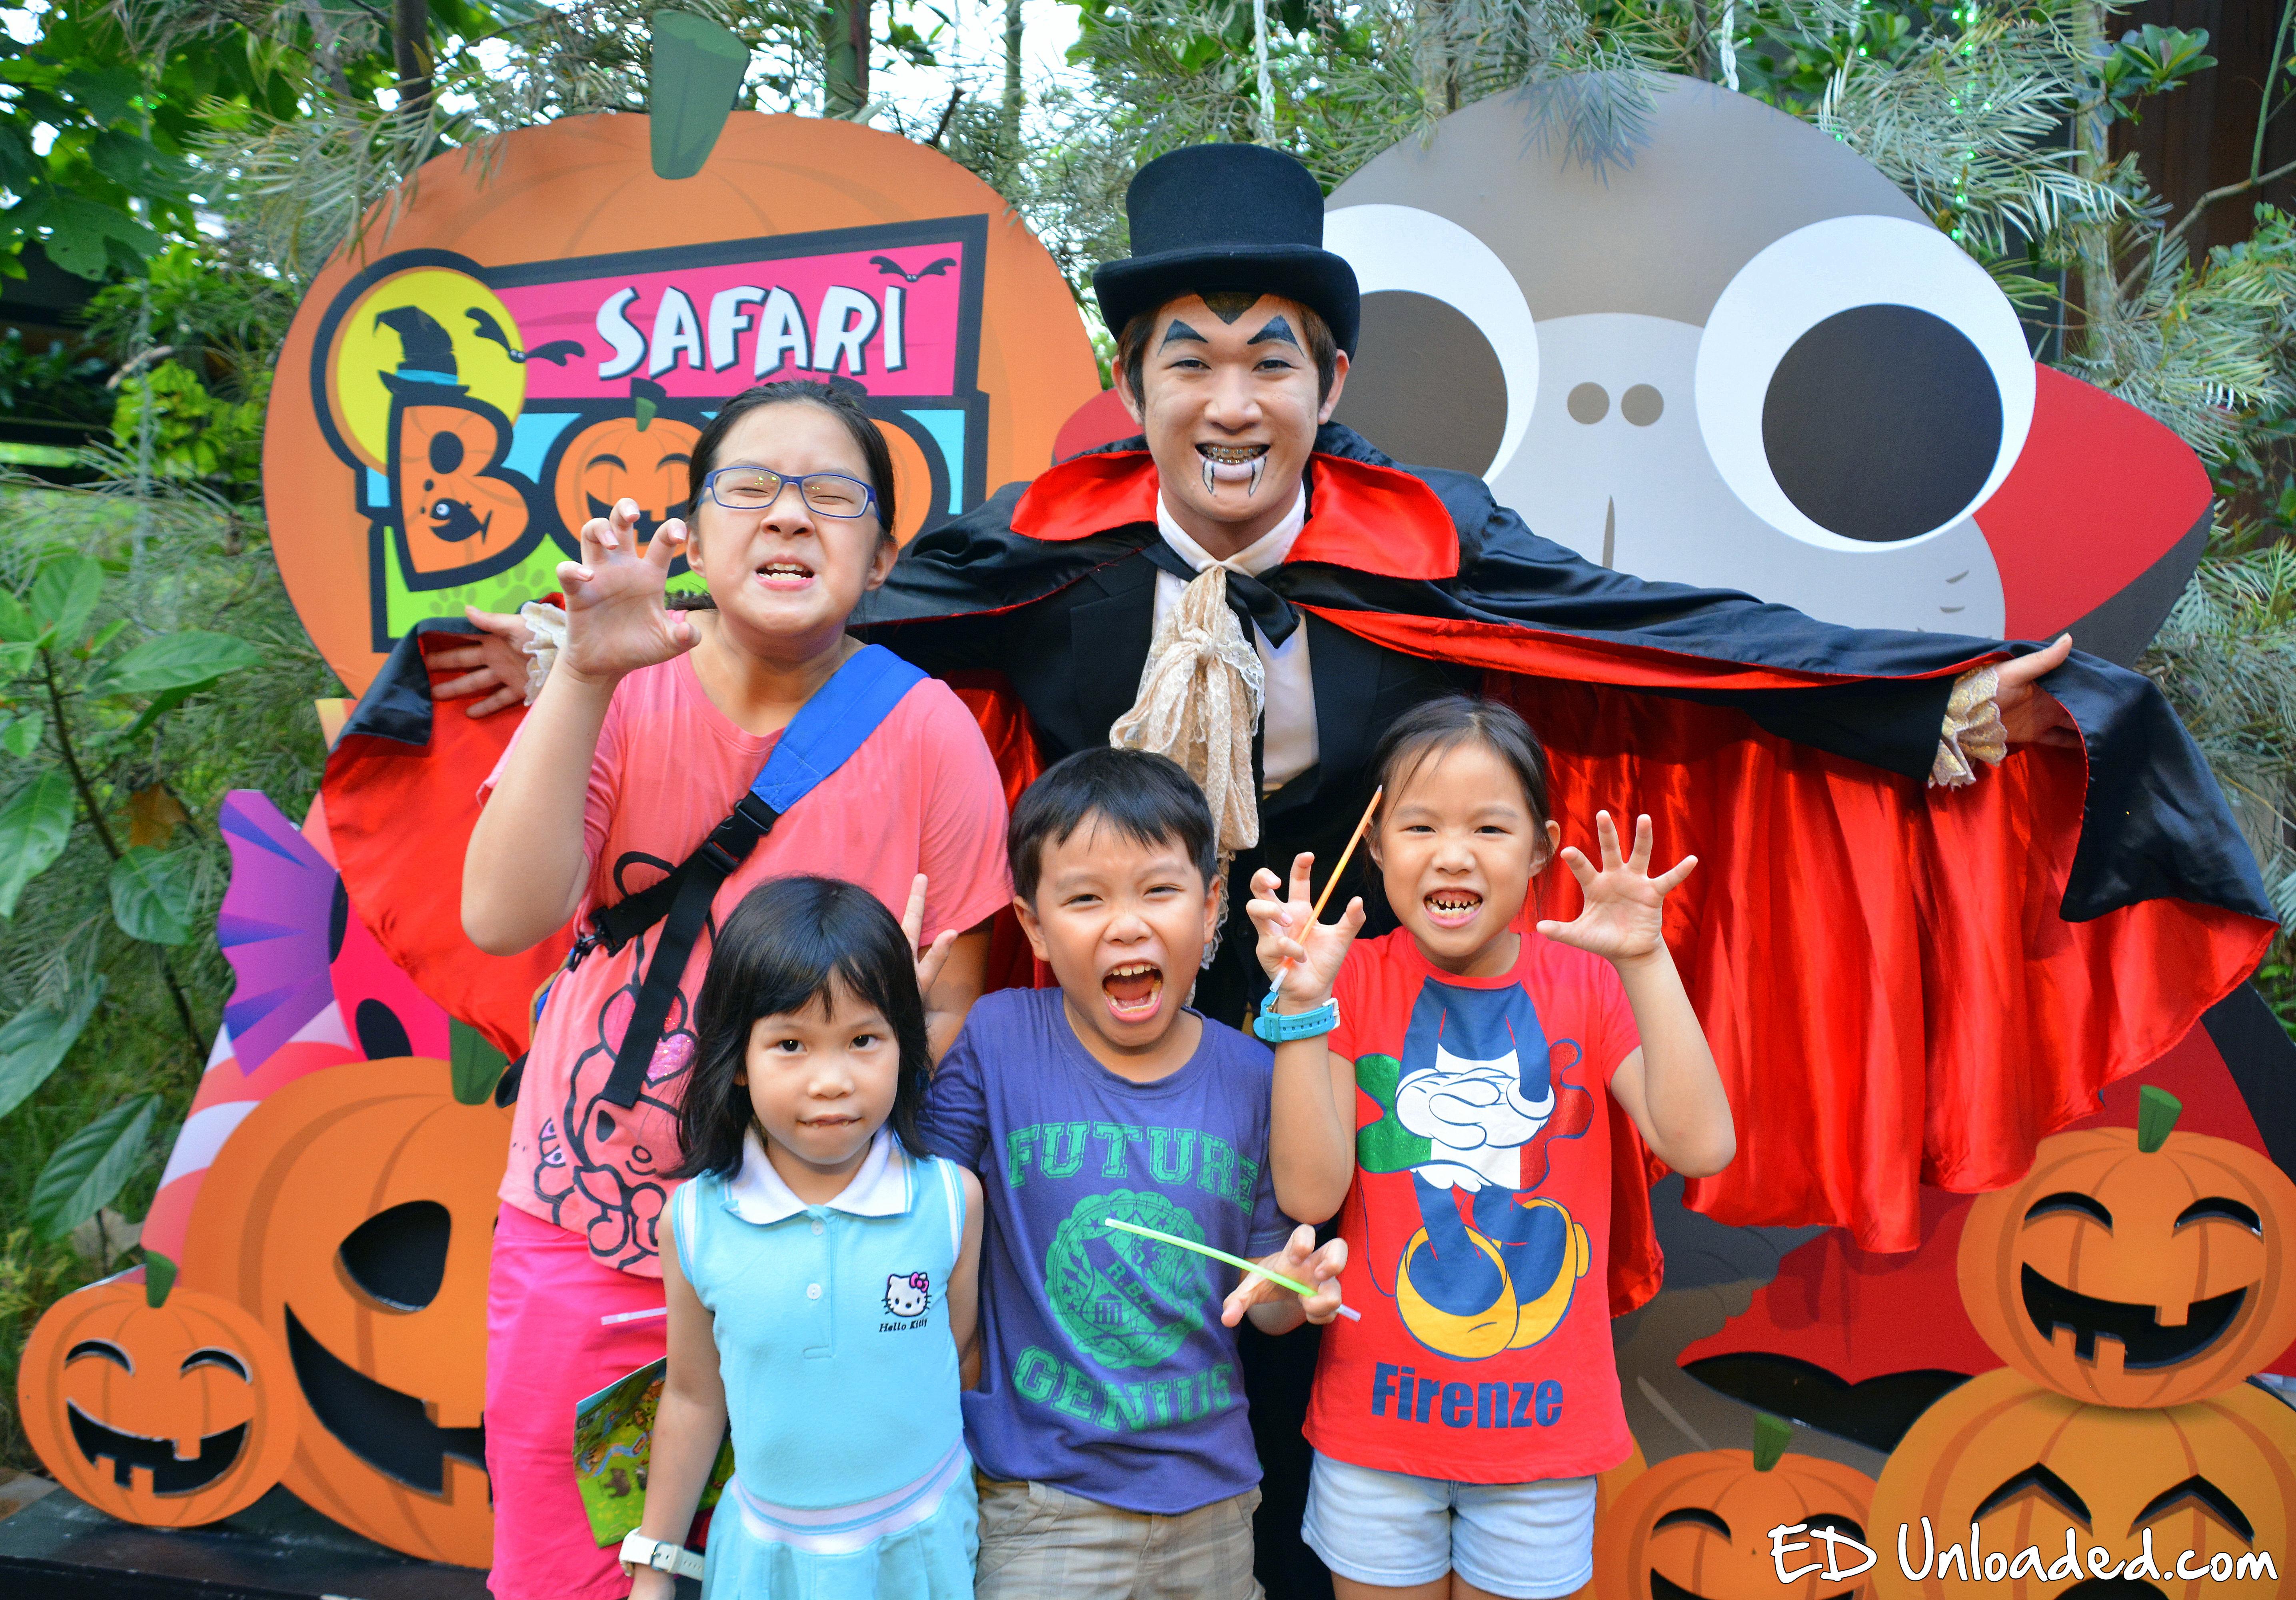 River Safari Halloween Party - Ed Unloaded.com | Parenting ...